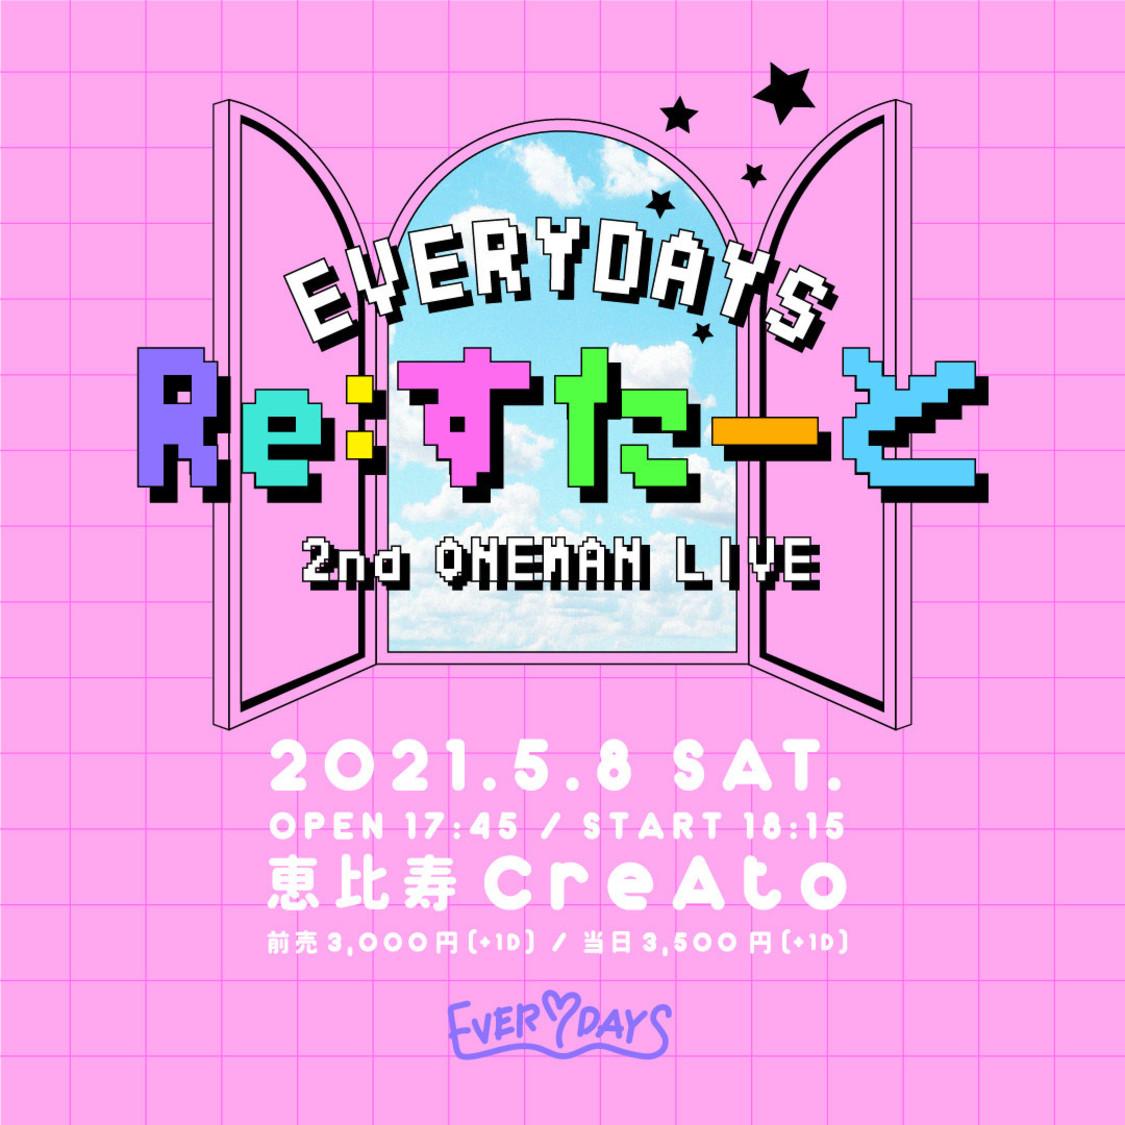 EVERYDAYS、2ndワンマン開催決定+Ayane&EMi卒業発表